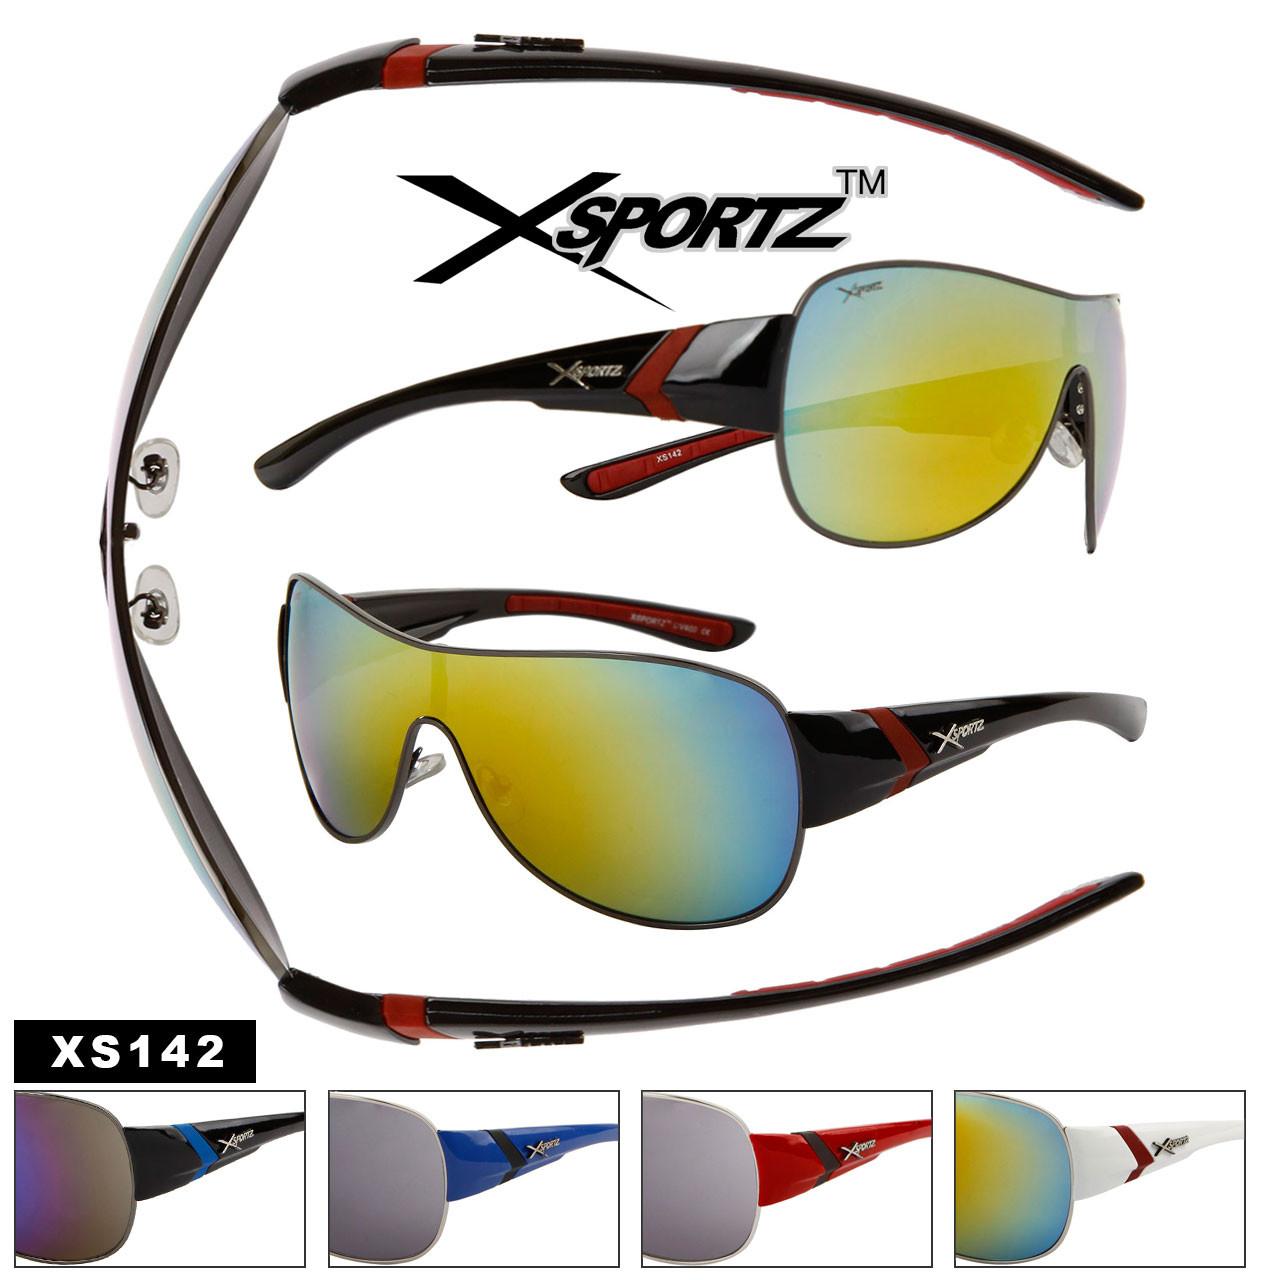 Bulk Mirrored Xsportz™Sunglasses - Style #XS142